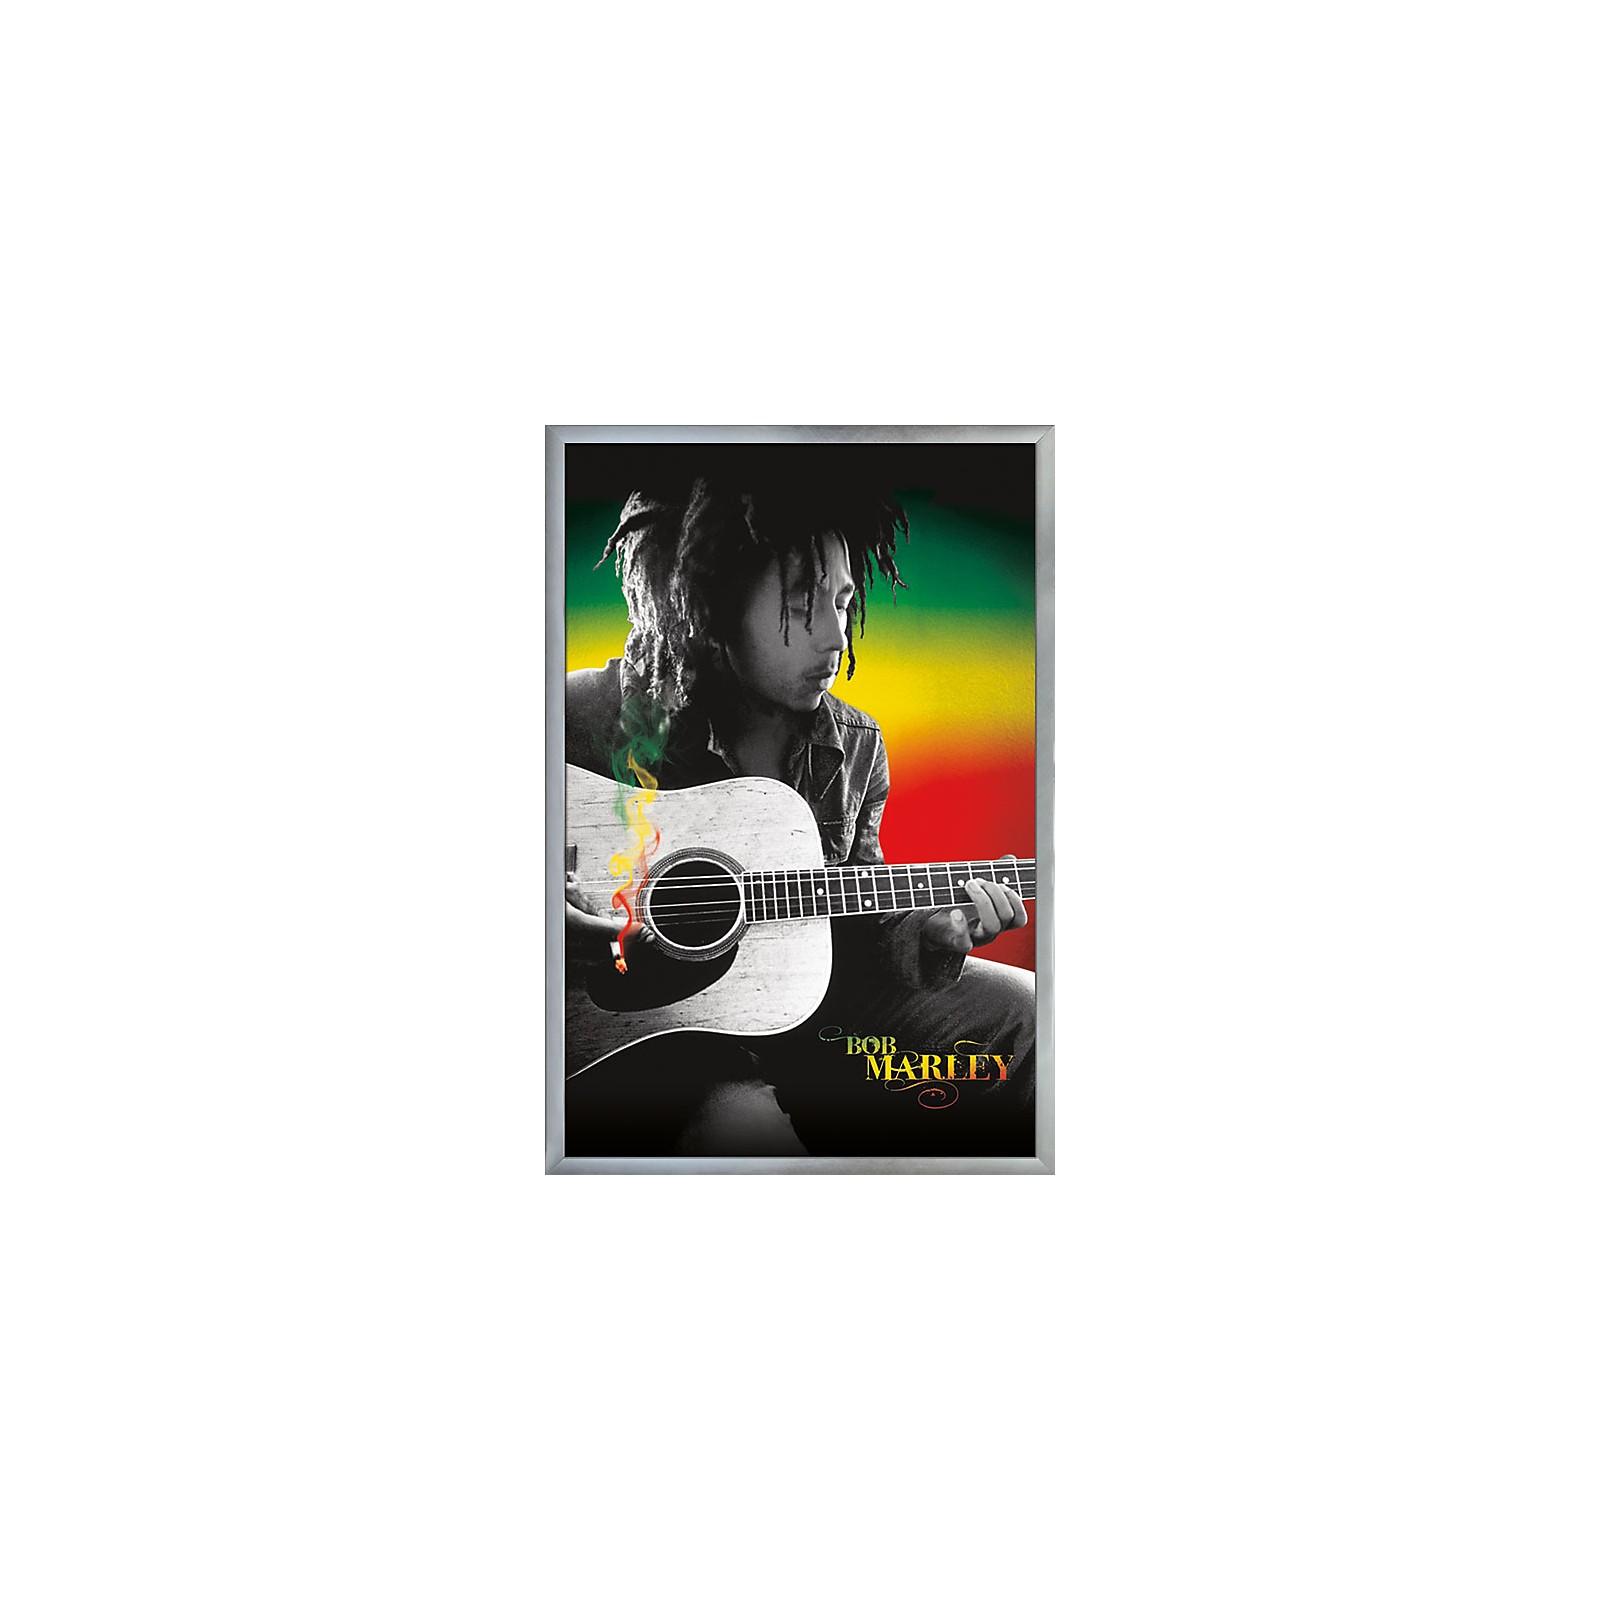 Trends International Bob Marley - Acoustic Guitar Poster